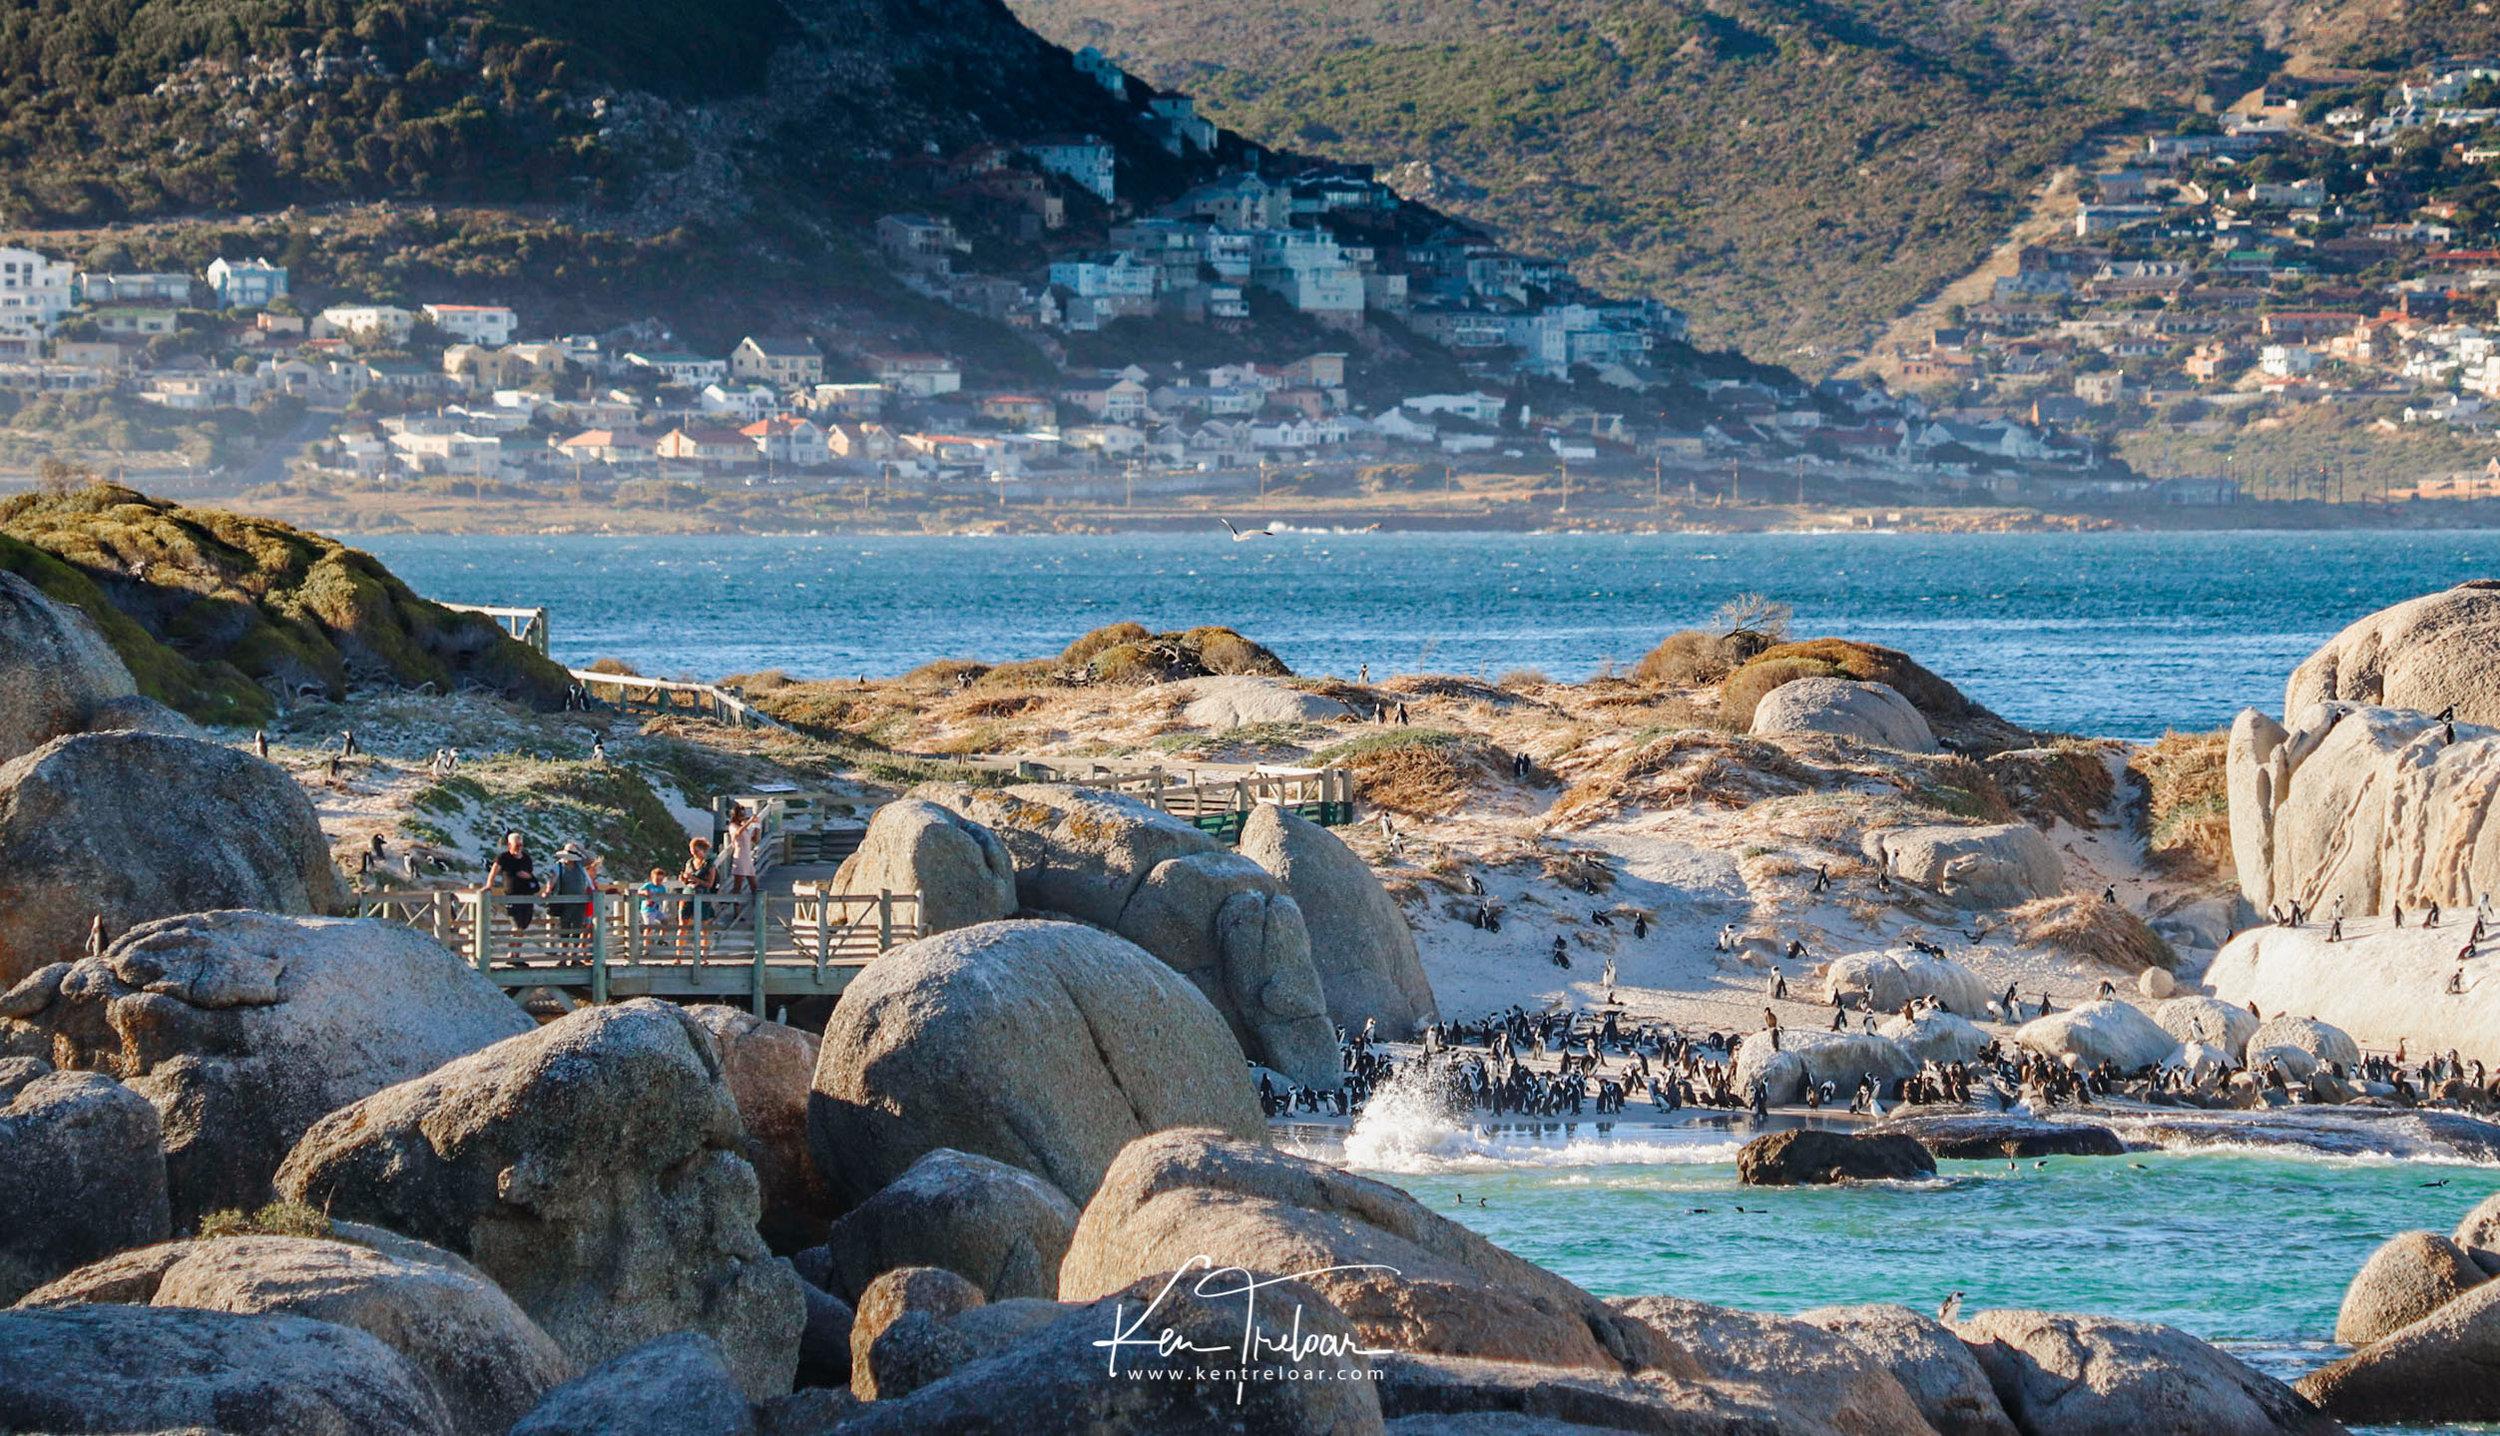 Boulders Beach Cape Town South Africa travel destination - Image by Ken Treloar Photography 2019-2.jpg